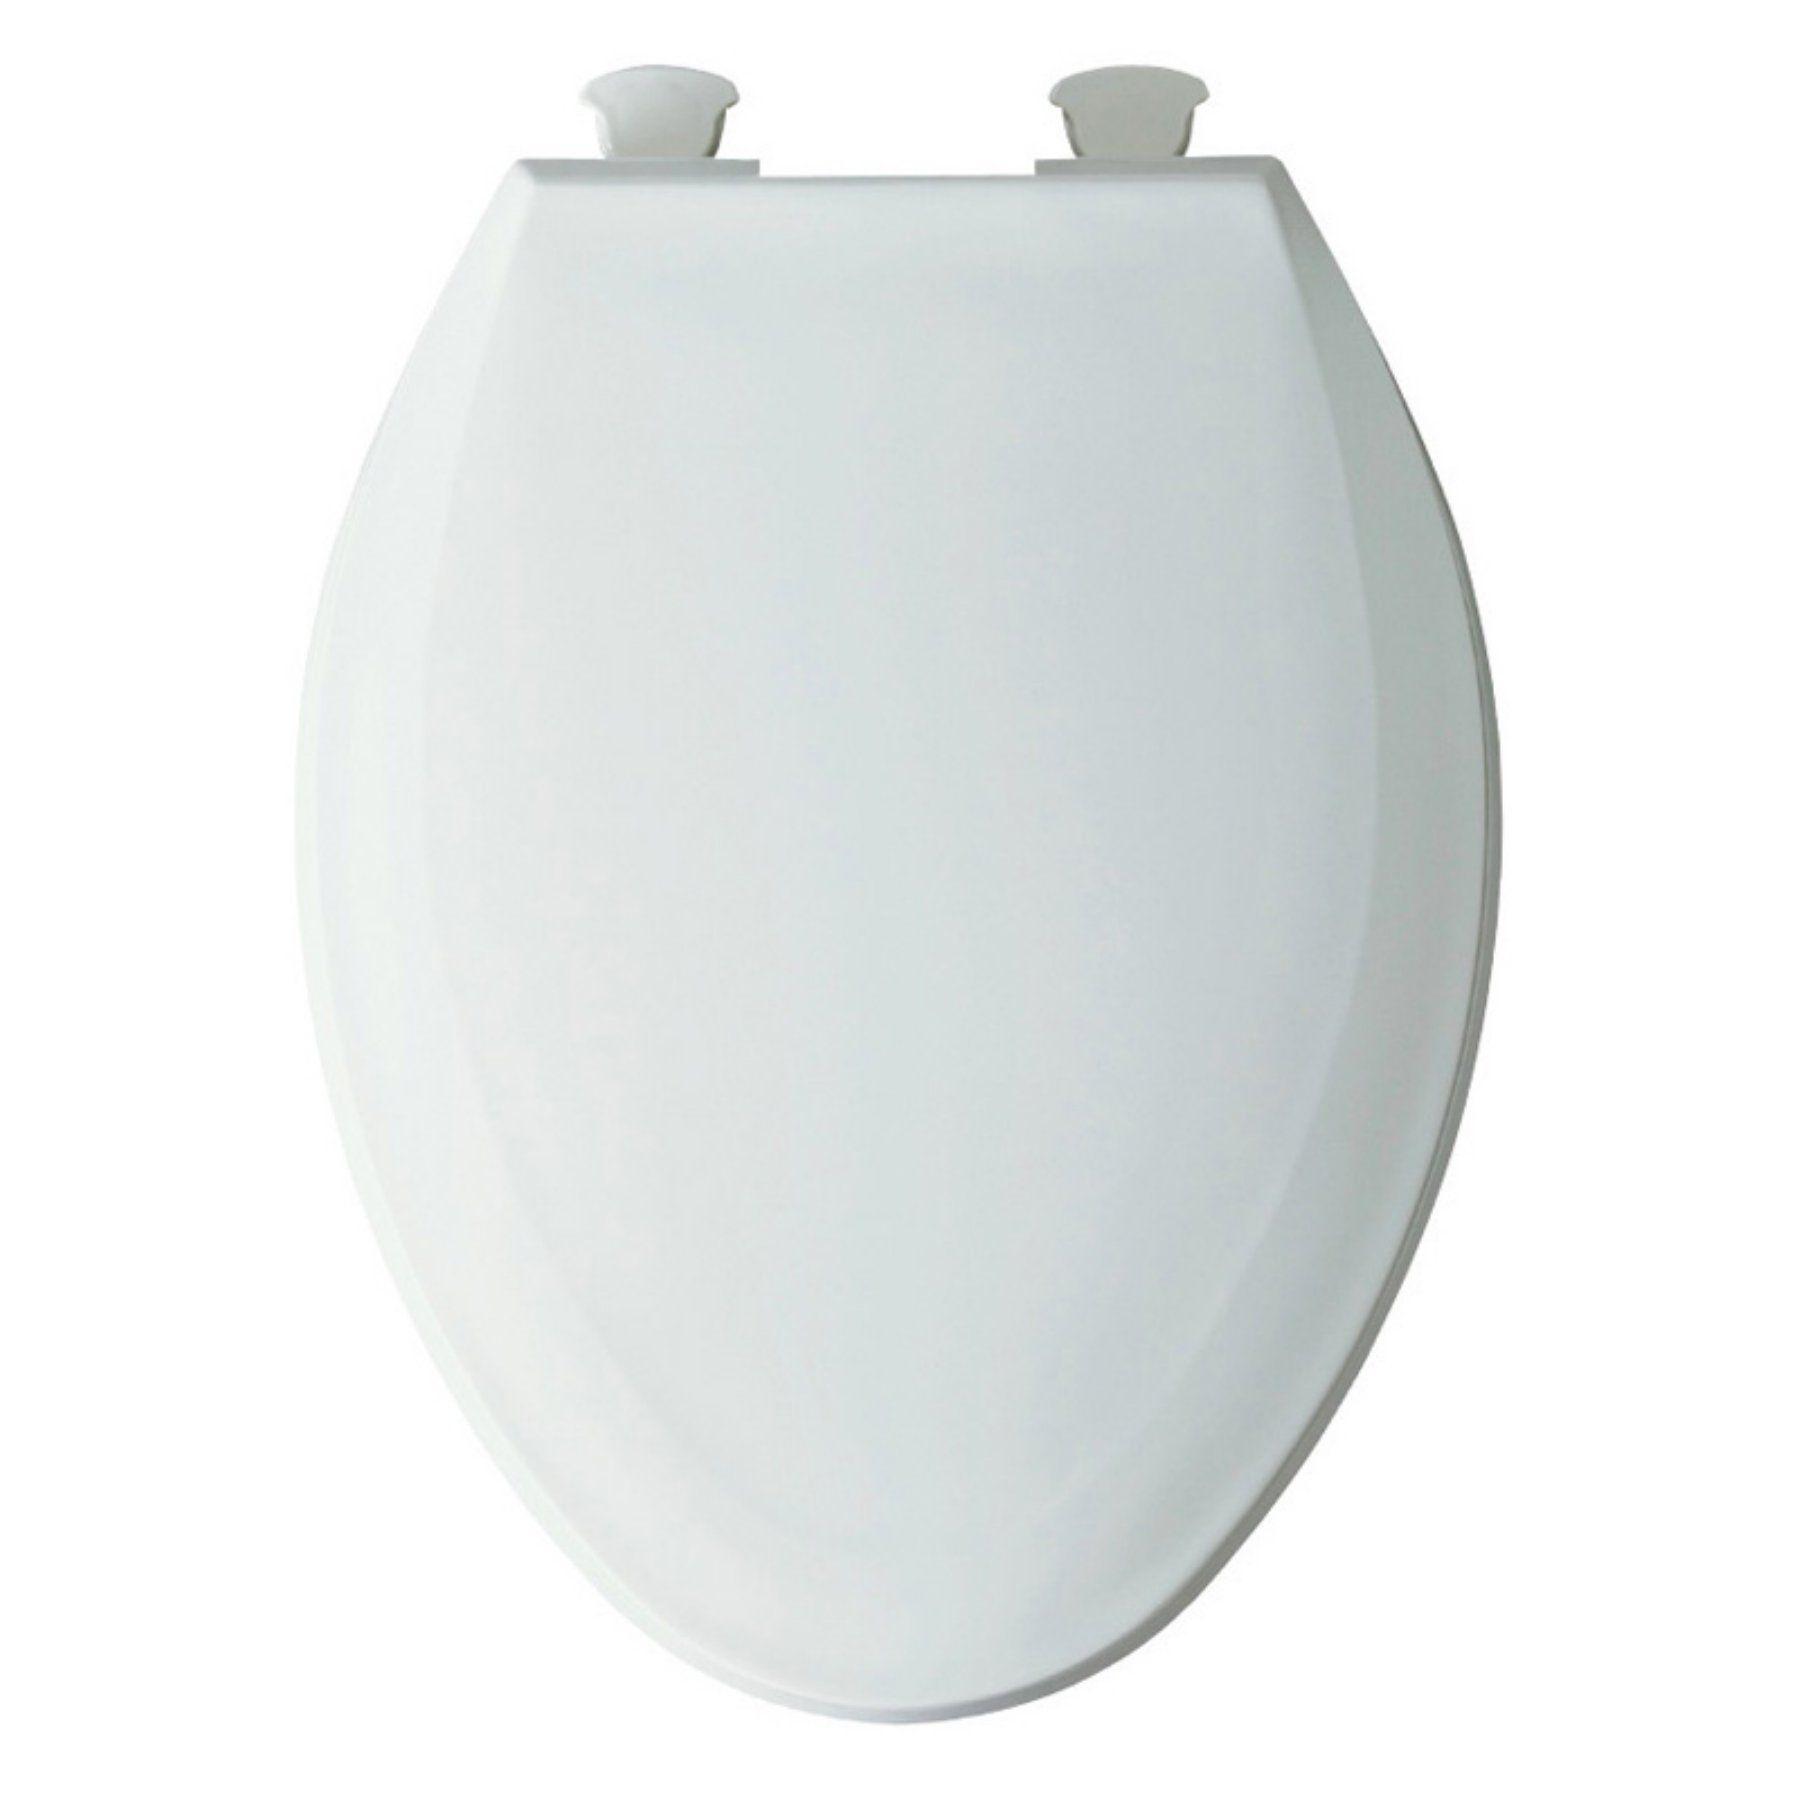 Bemis 1100ec Elongated White Plastic Toilet Seat Toilet Seat